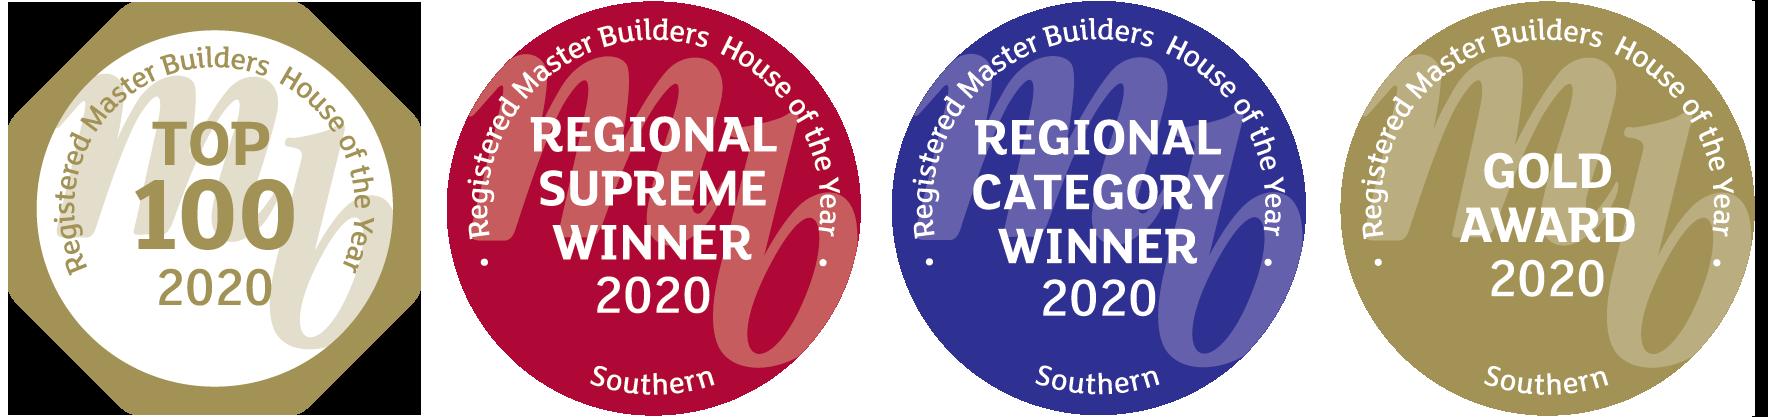 Master Builders Awards Dalefield